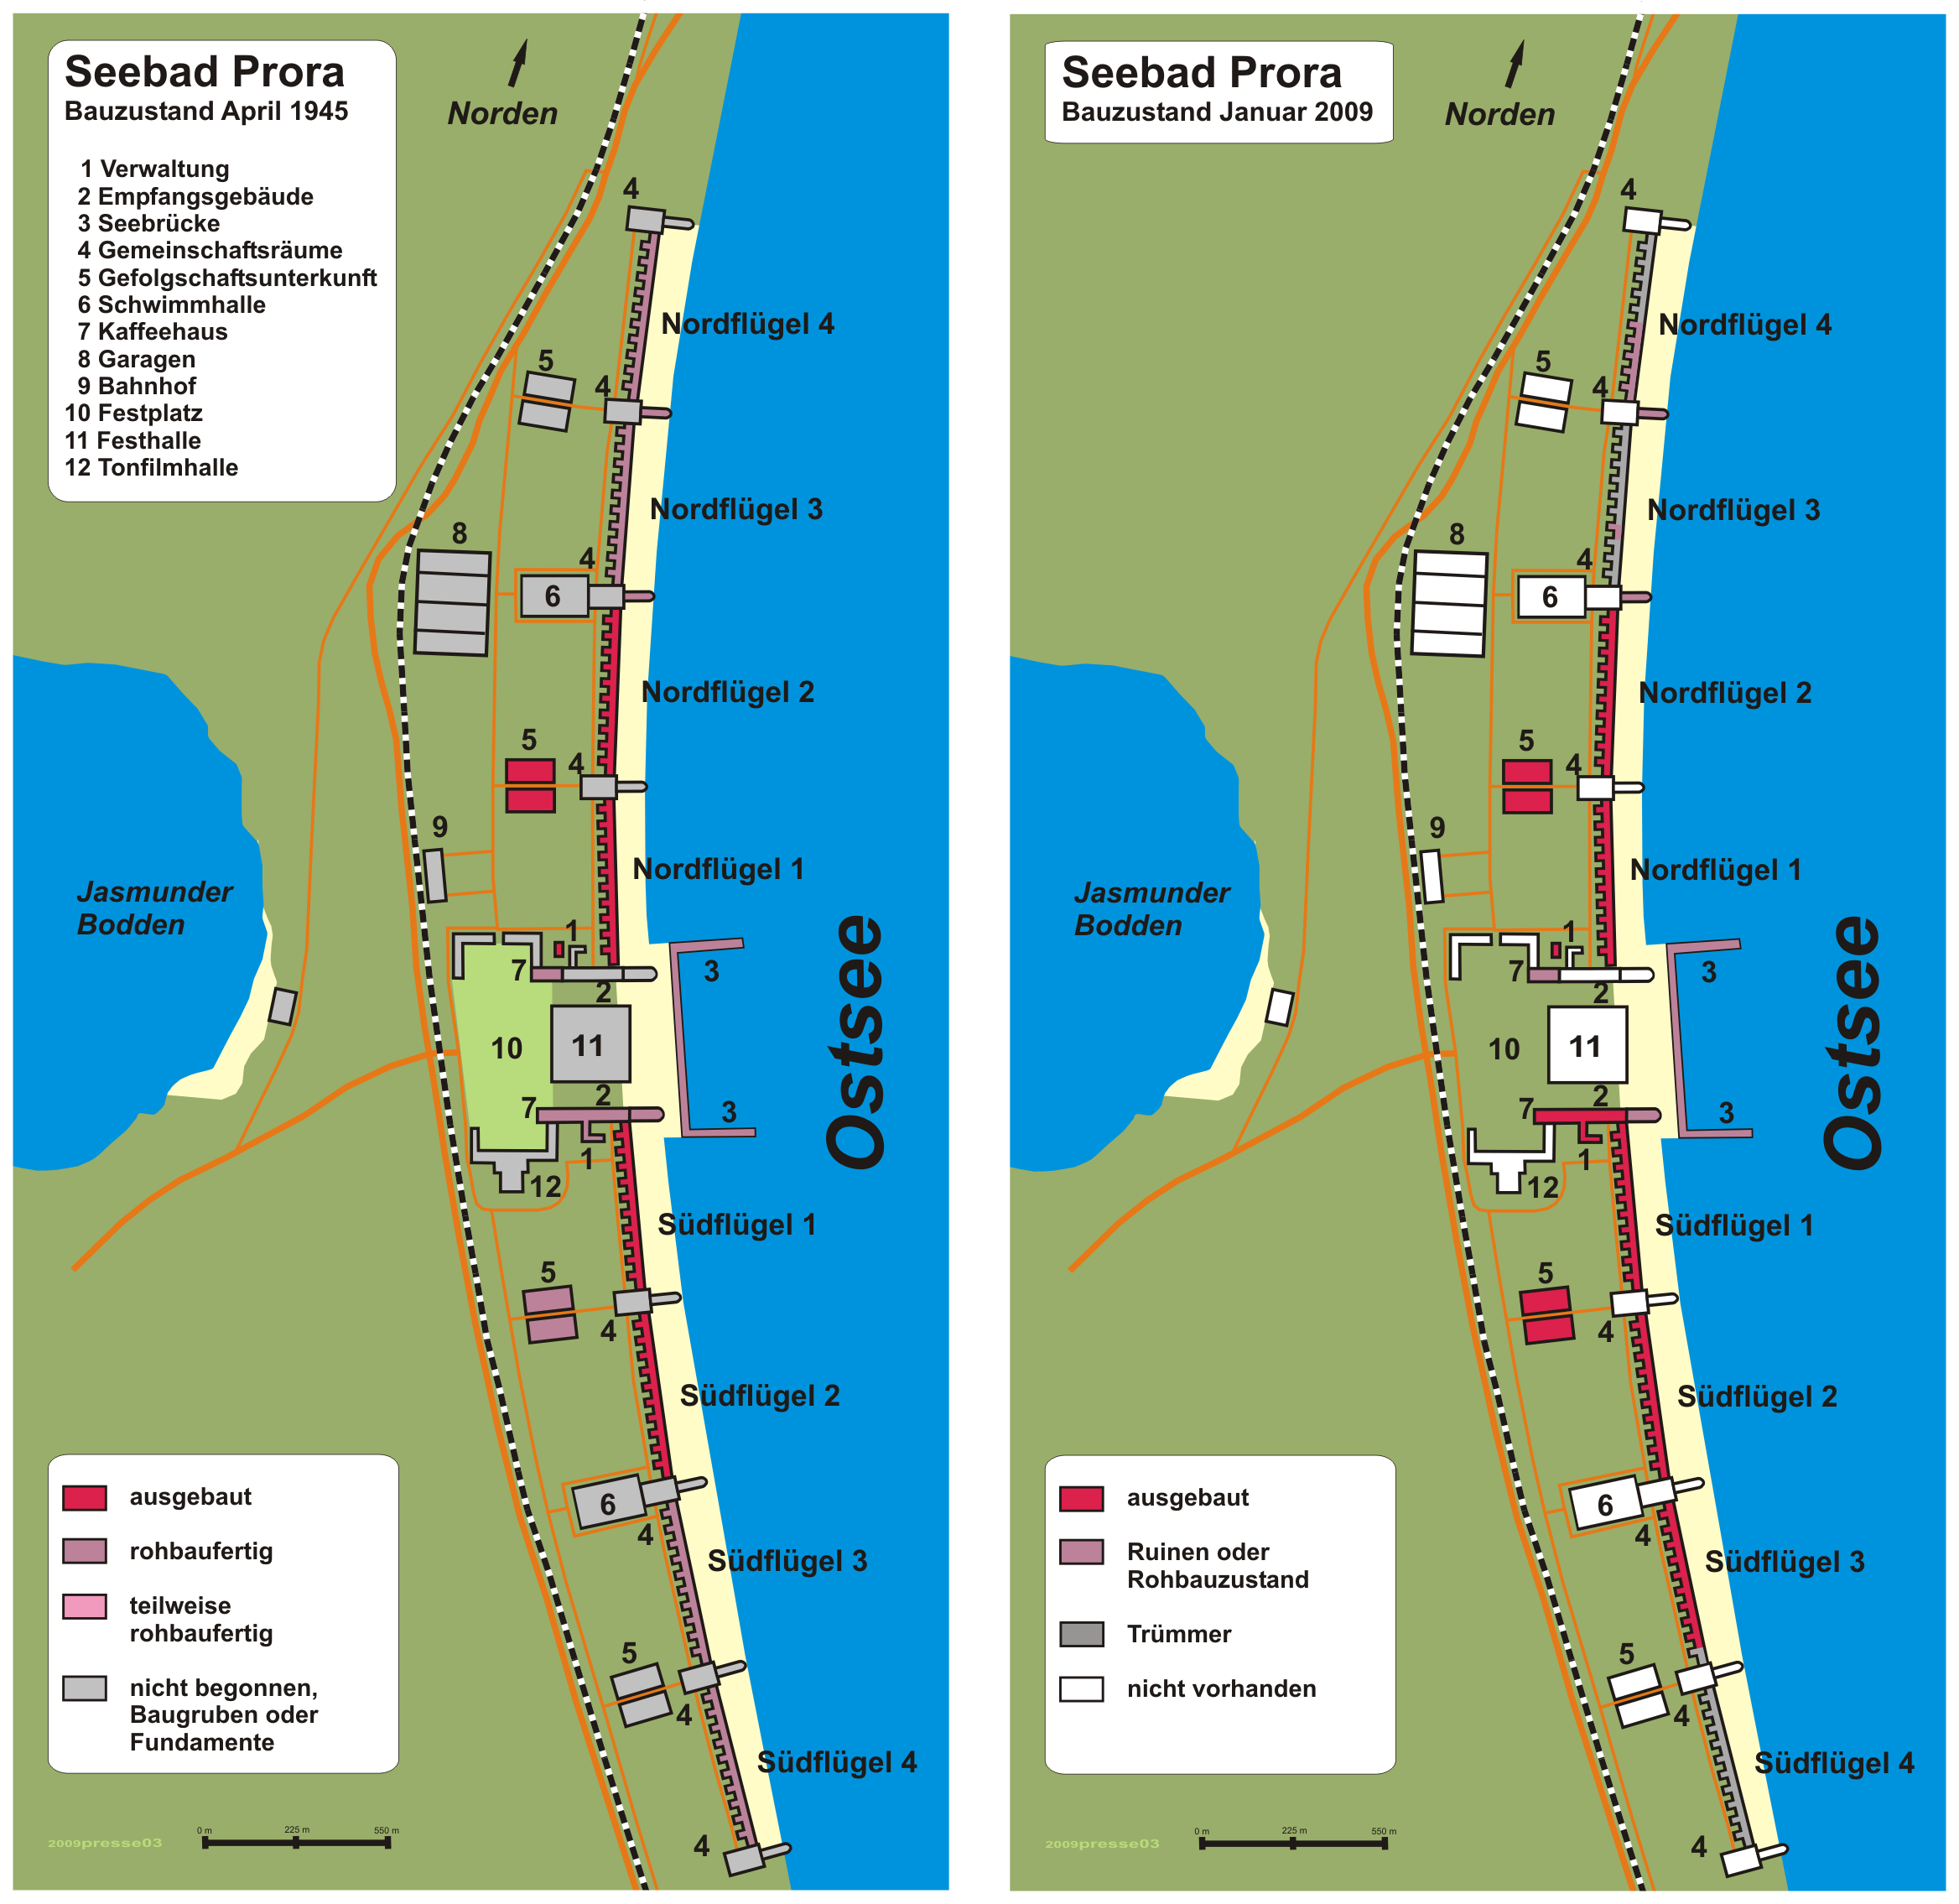 The Prora Resort On Germany S Rugan Island